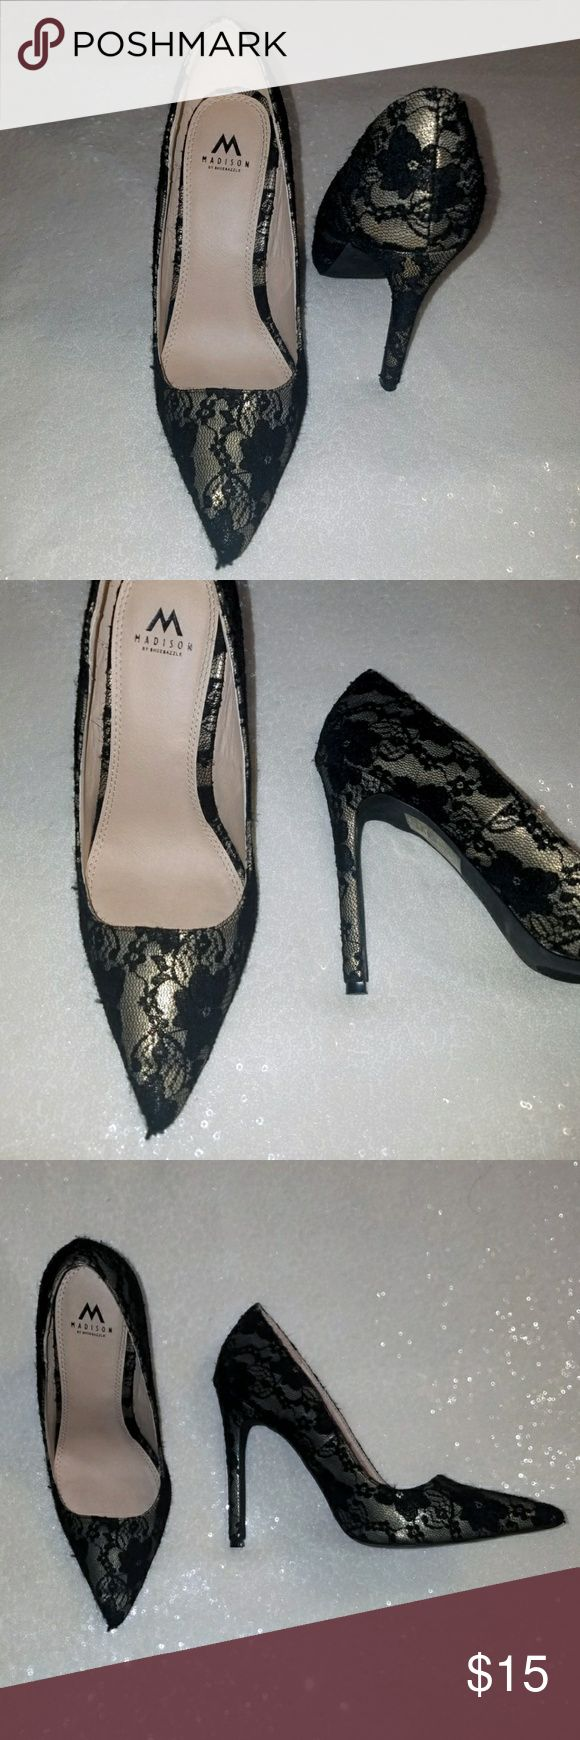 "NWOT, BLACK LEAVE 4.5"" heel! Perfect condition, black lace over gold heel. Shoe dazzle. 4.5"" Shoe Dazzle Shoes Heels"